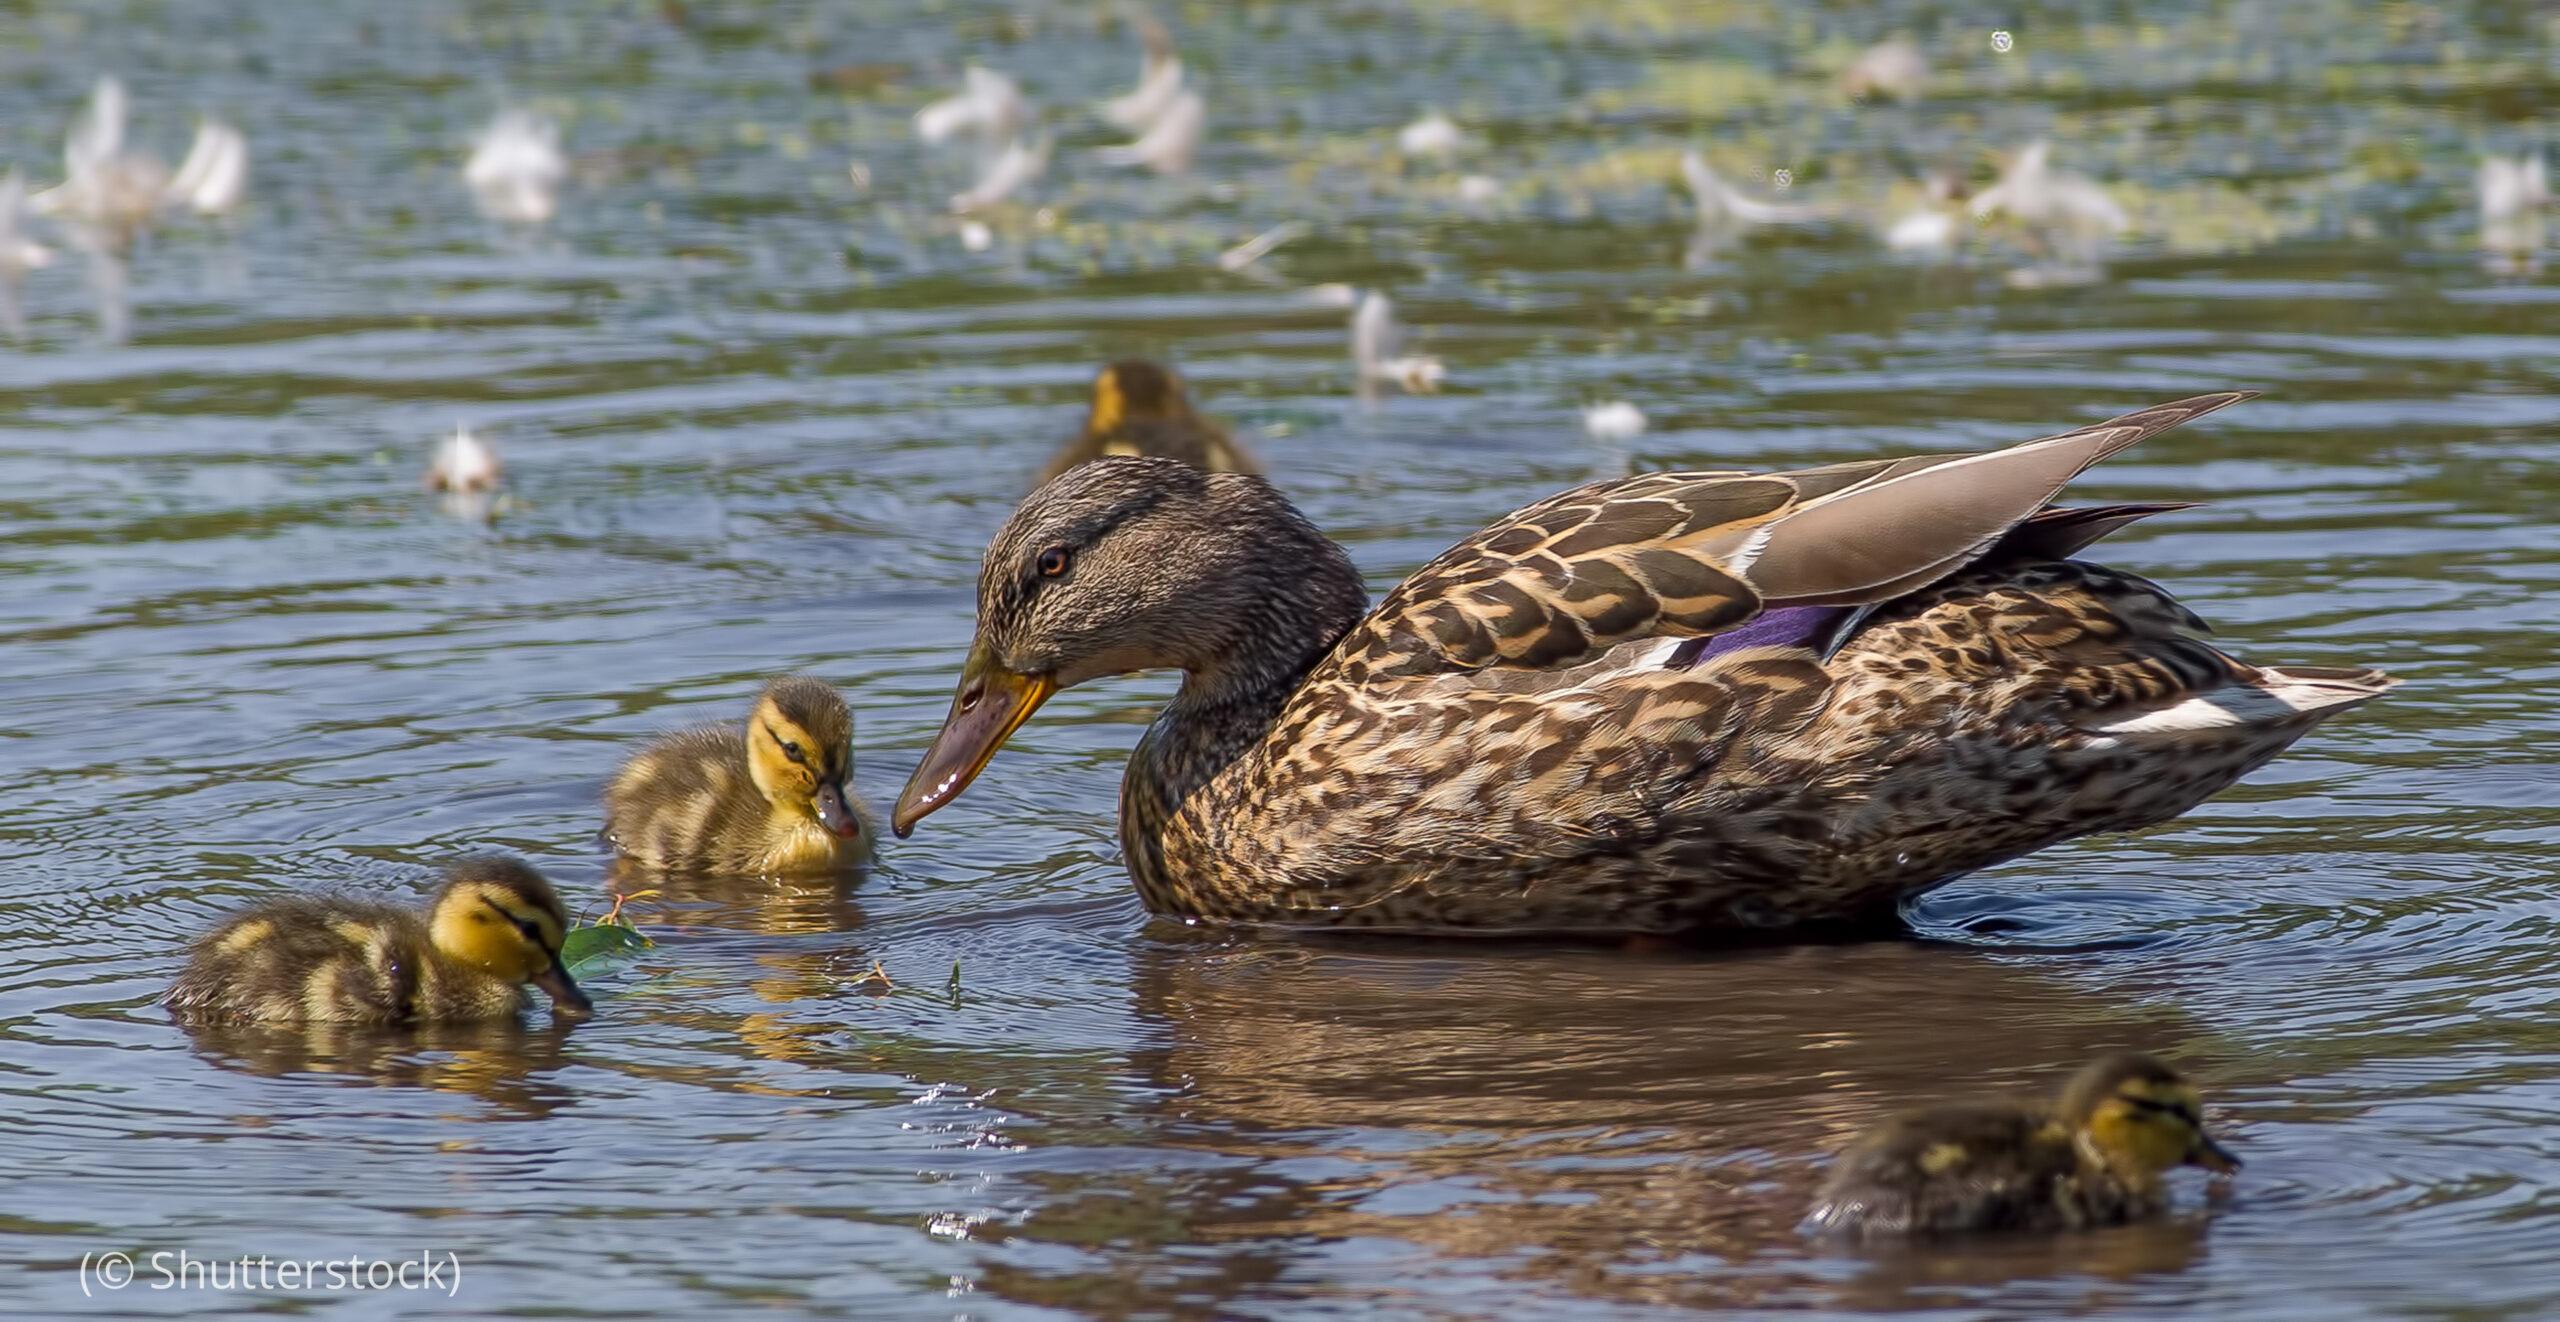 Female mallard duck swimming with chicks (© Shutterstock)